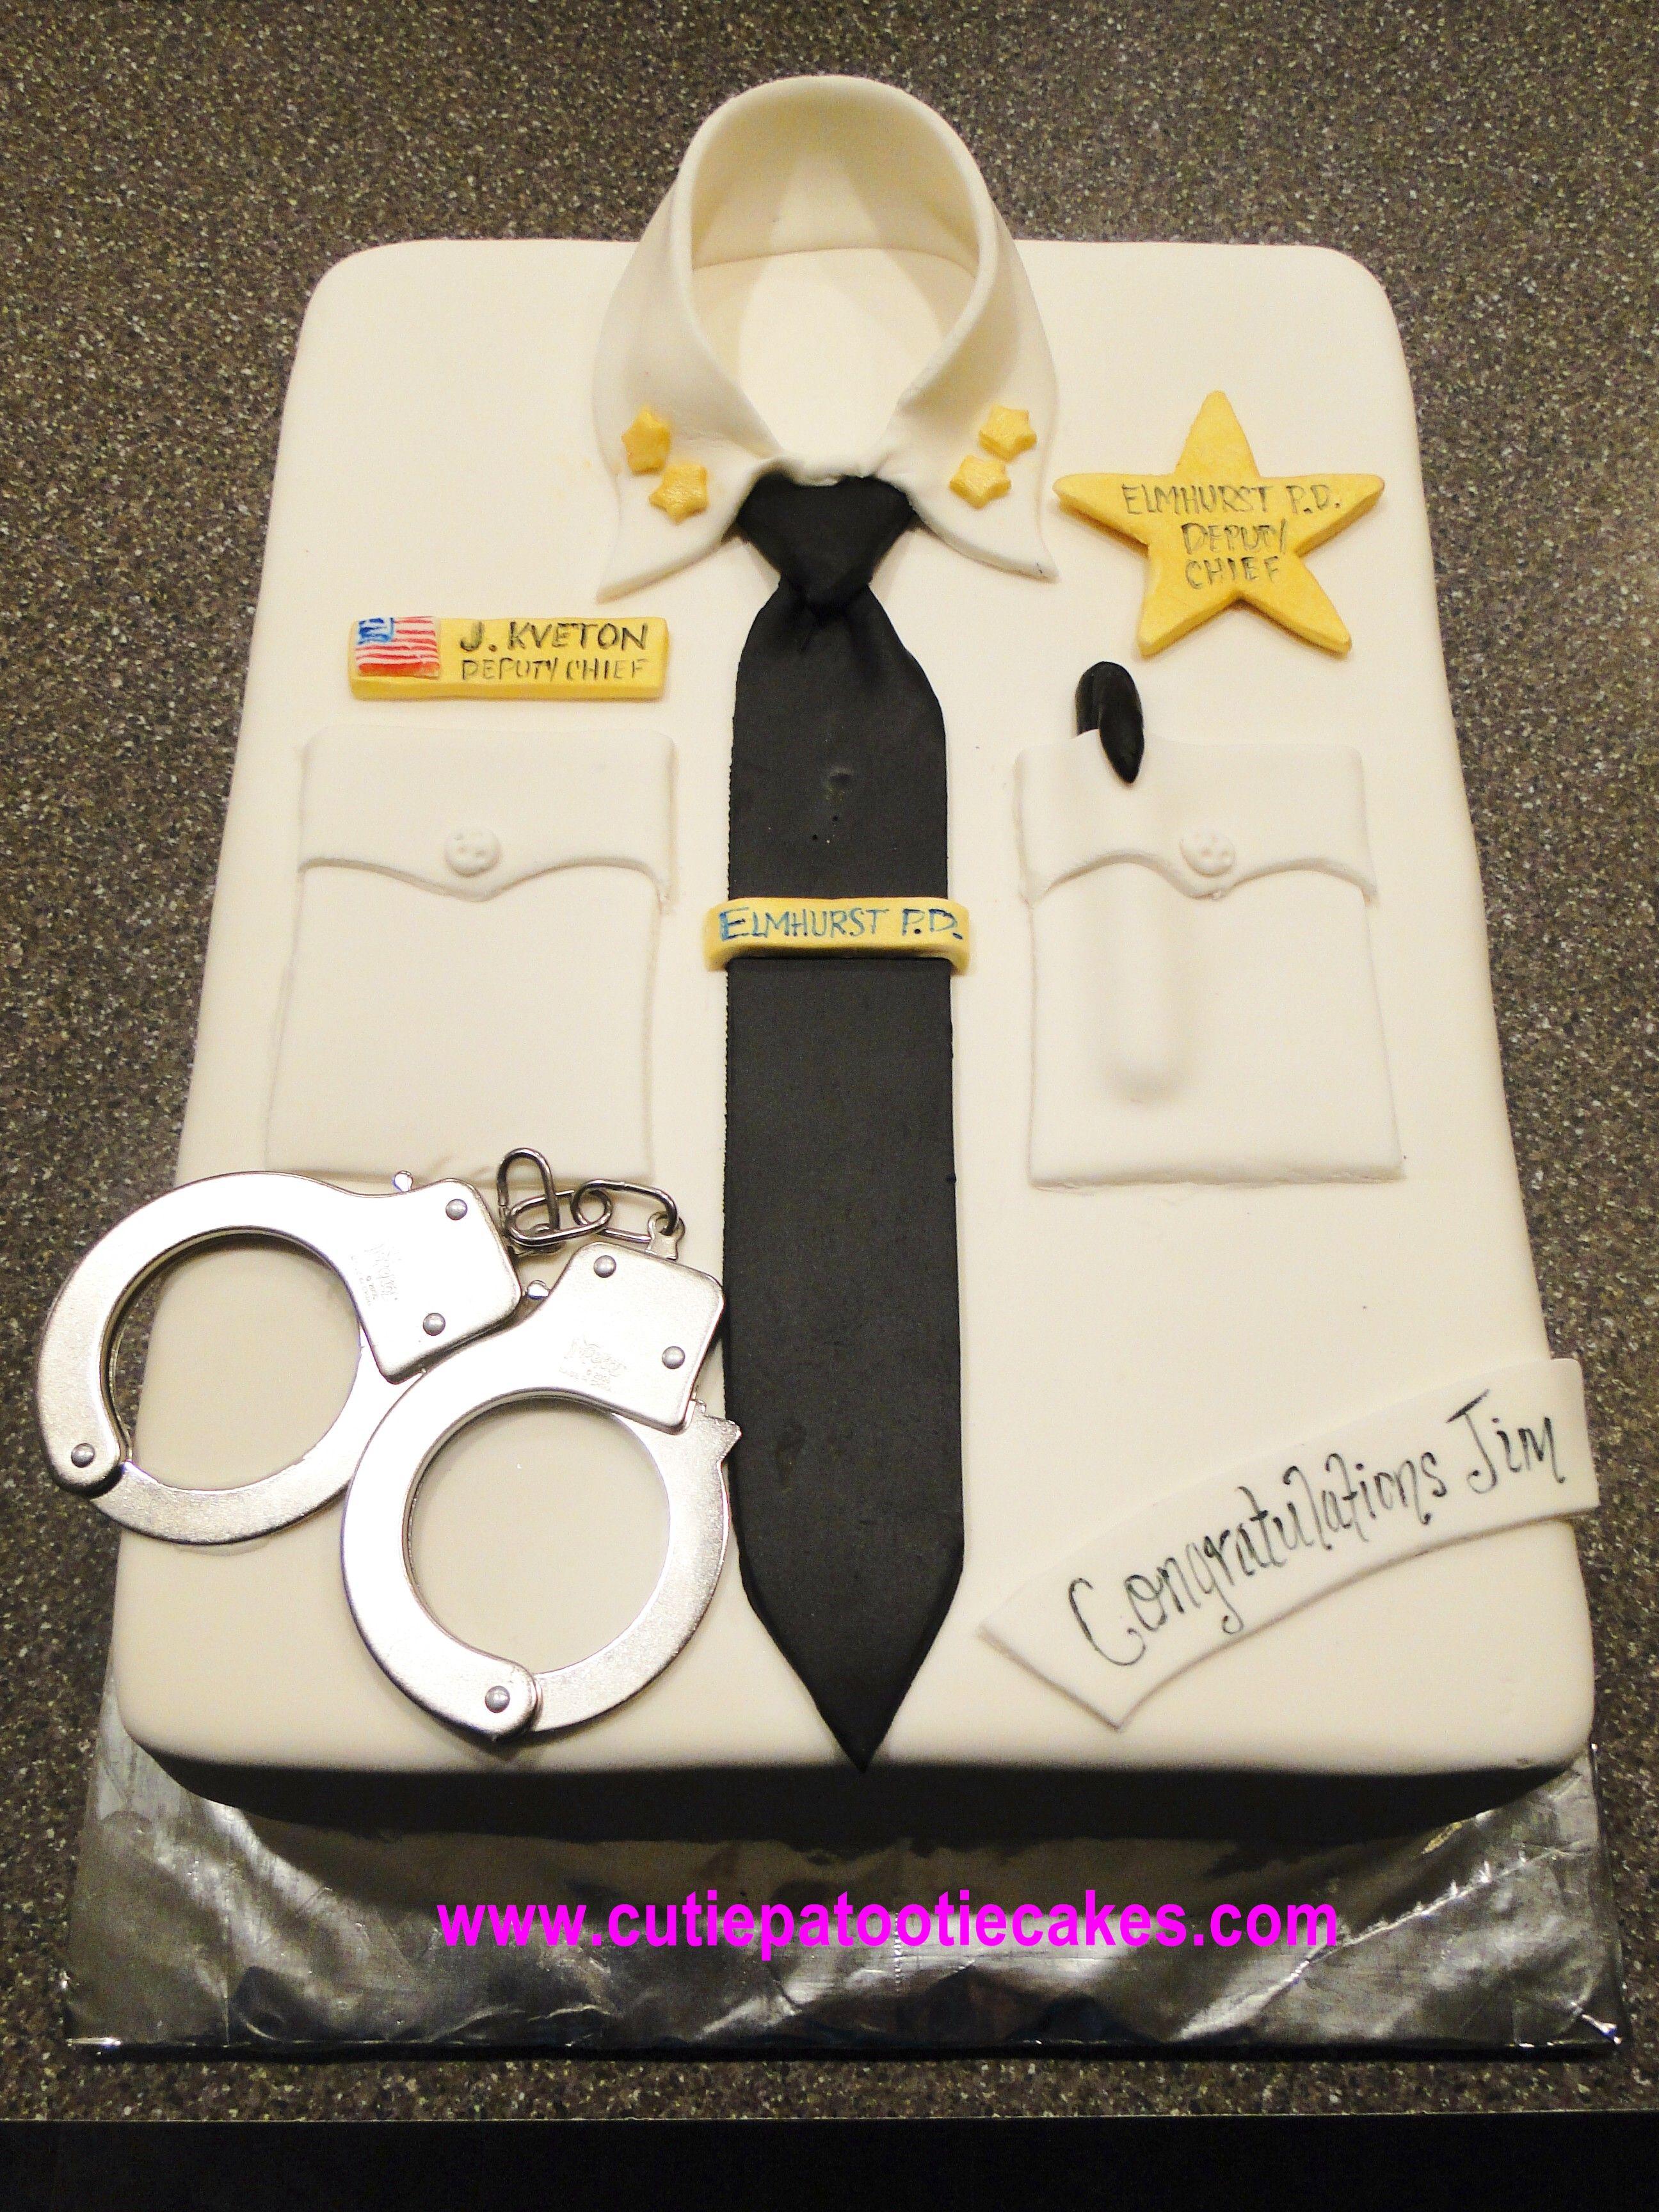 Police Shirt Cake Shirt Cake Police Cakes Fireman Cake